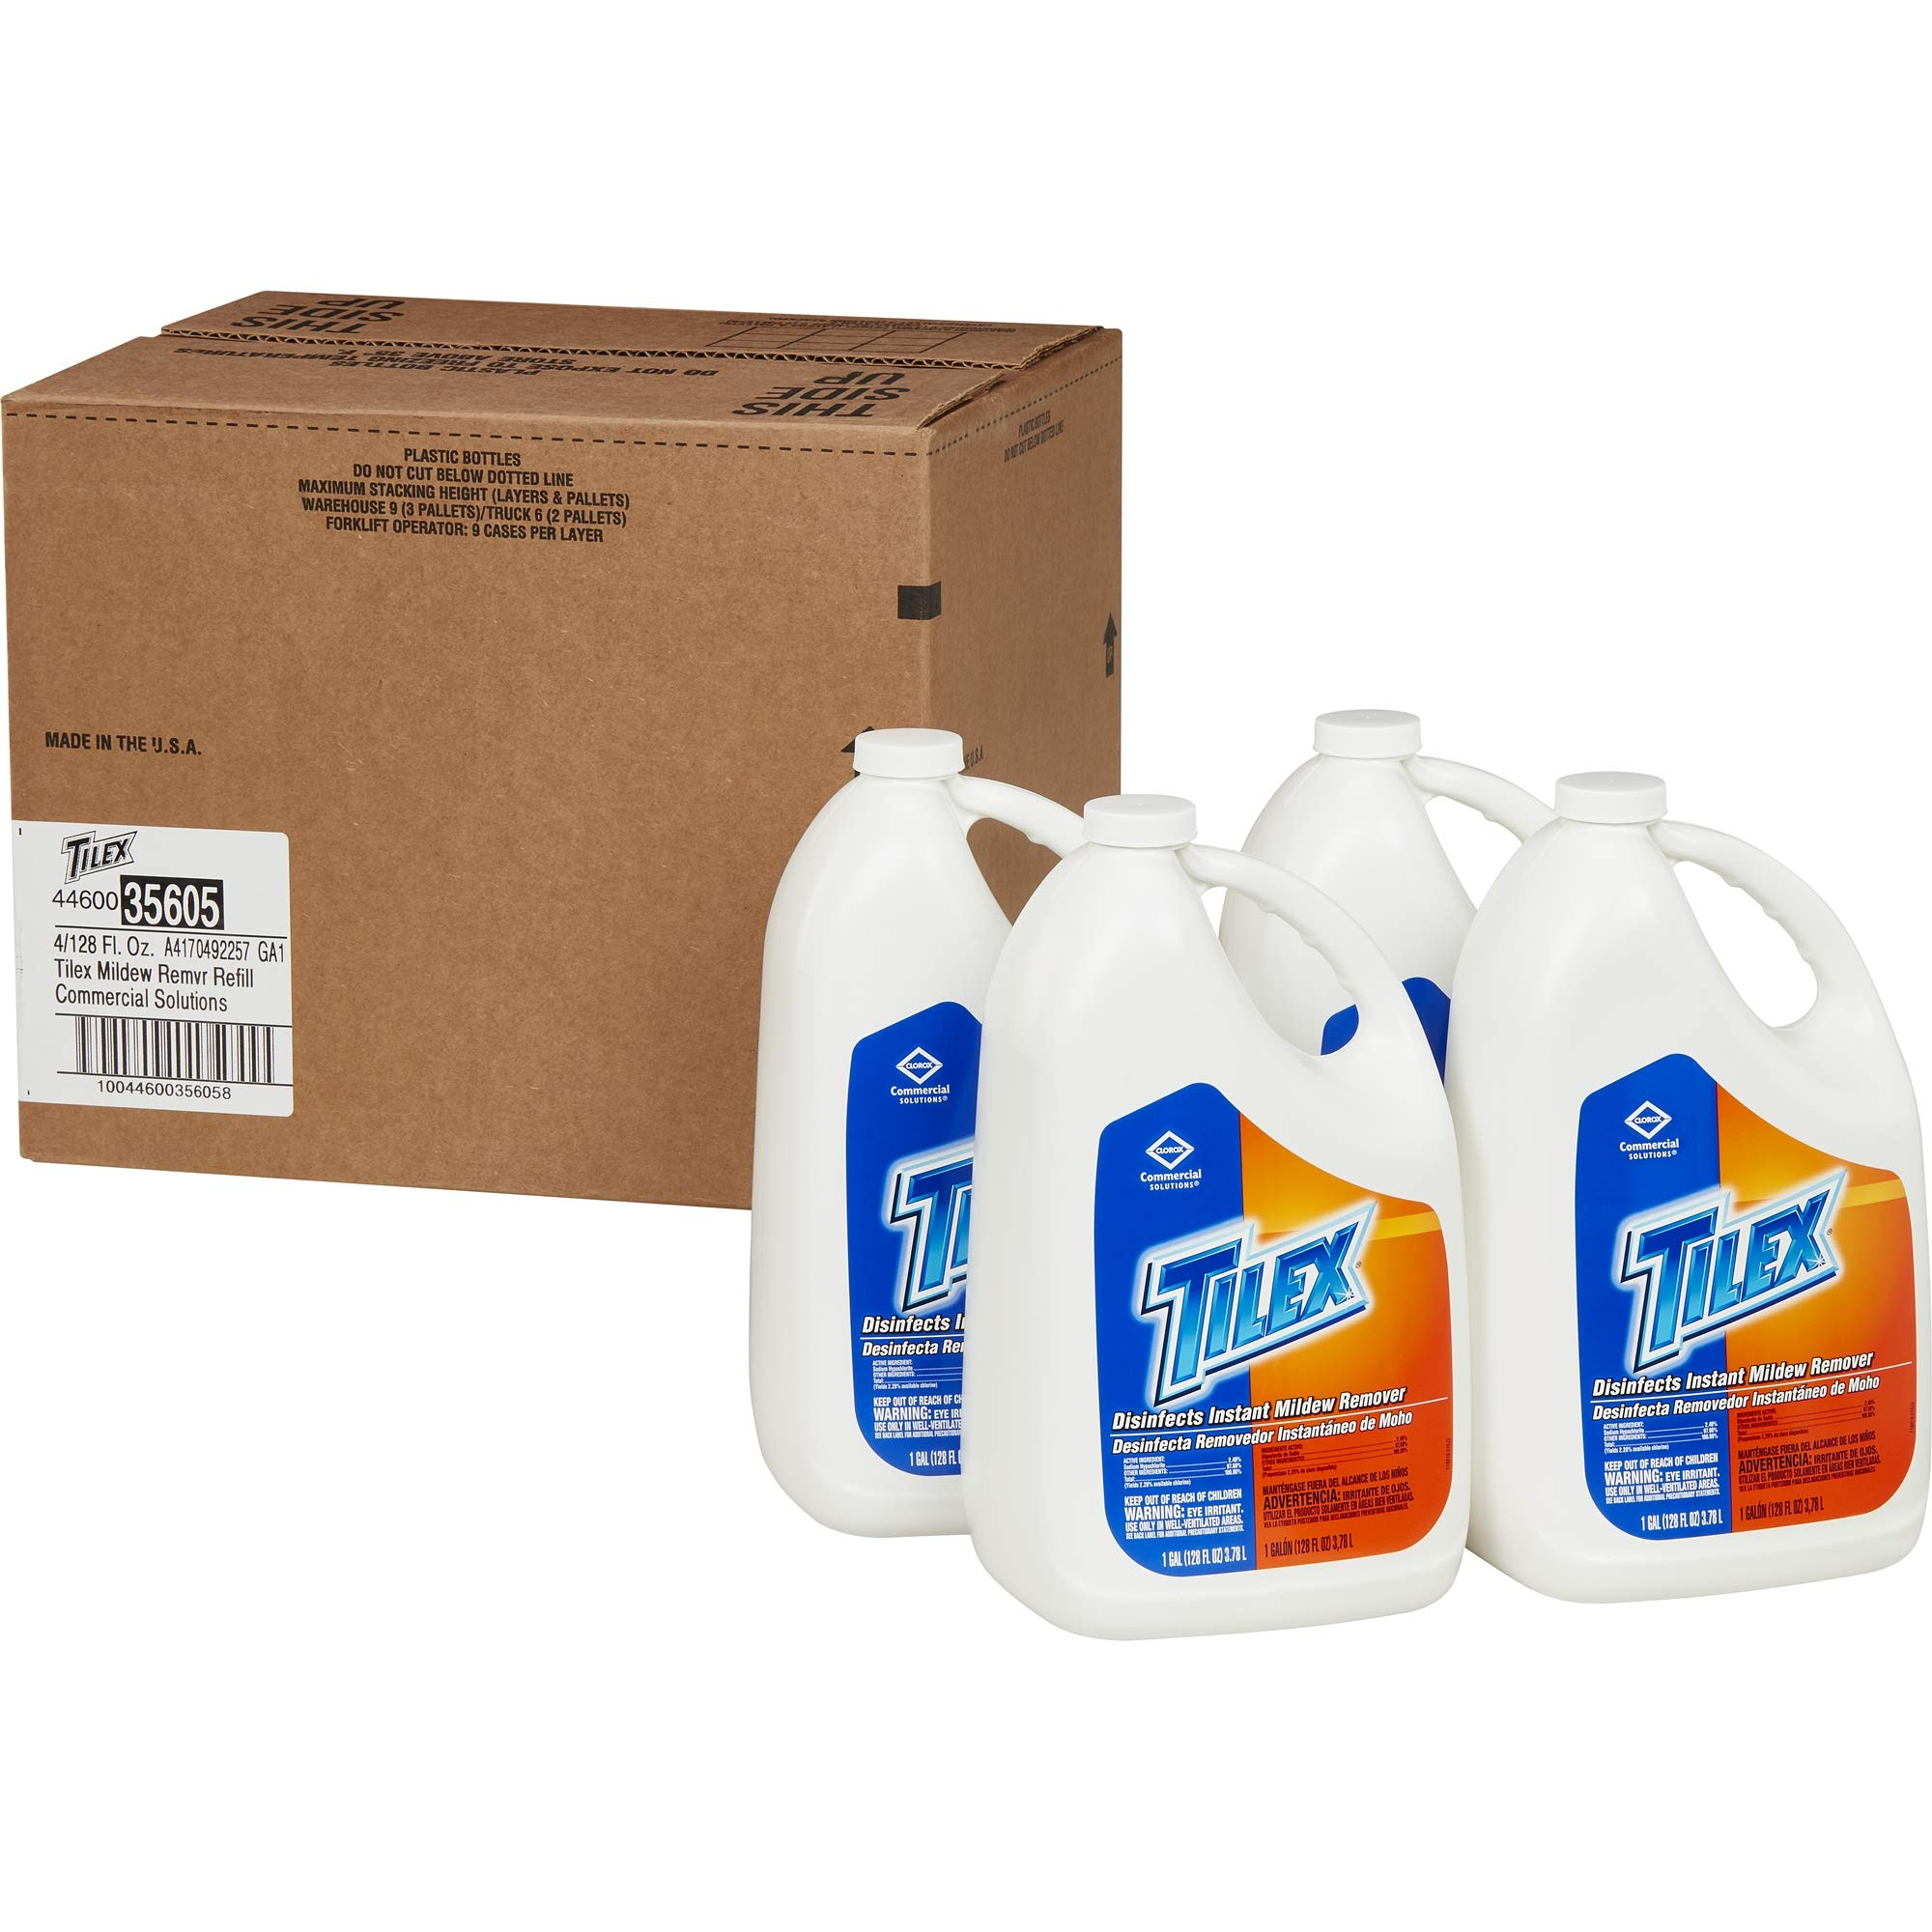 Tilex Disinfects Instant Mildew Remover, Refill, 128 Ounces, 4 Bottles/Case (35605) by Tilex